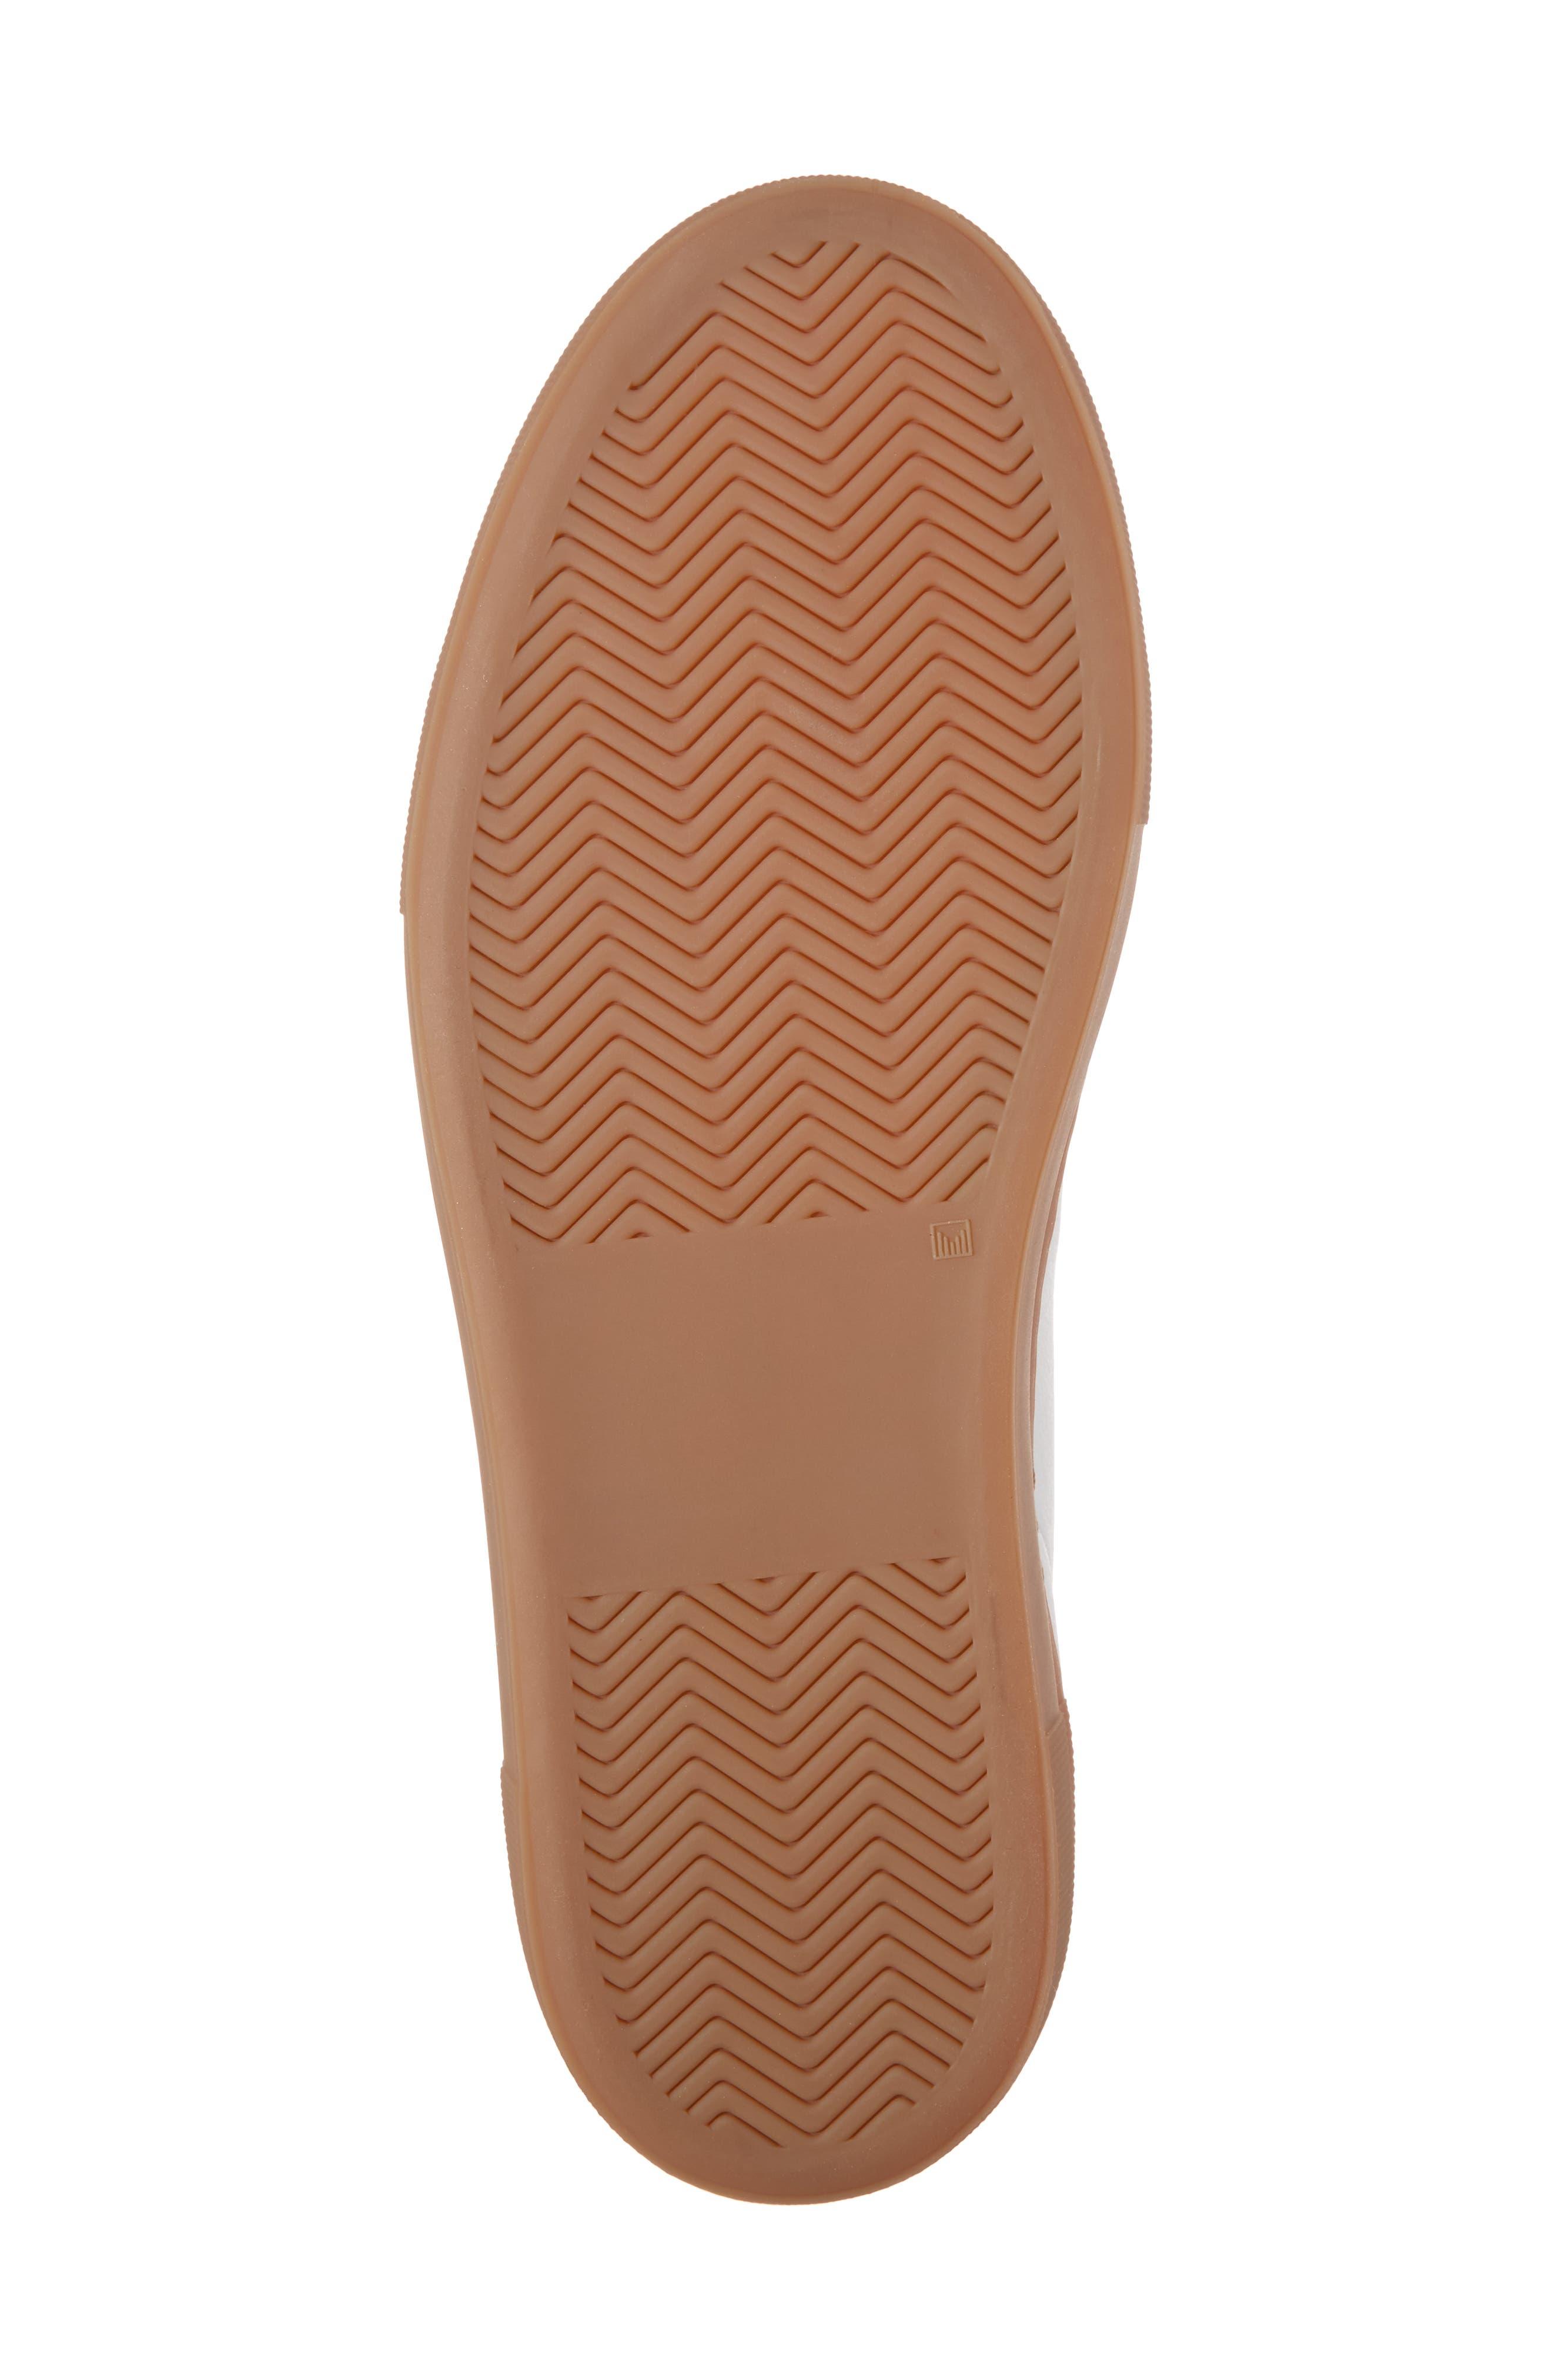 Clean 360 Fuzzy Heel Sneaker,                             Alternate thumbnail 6, color,                             100